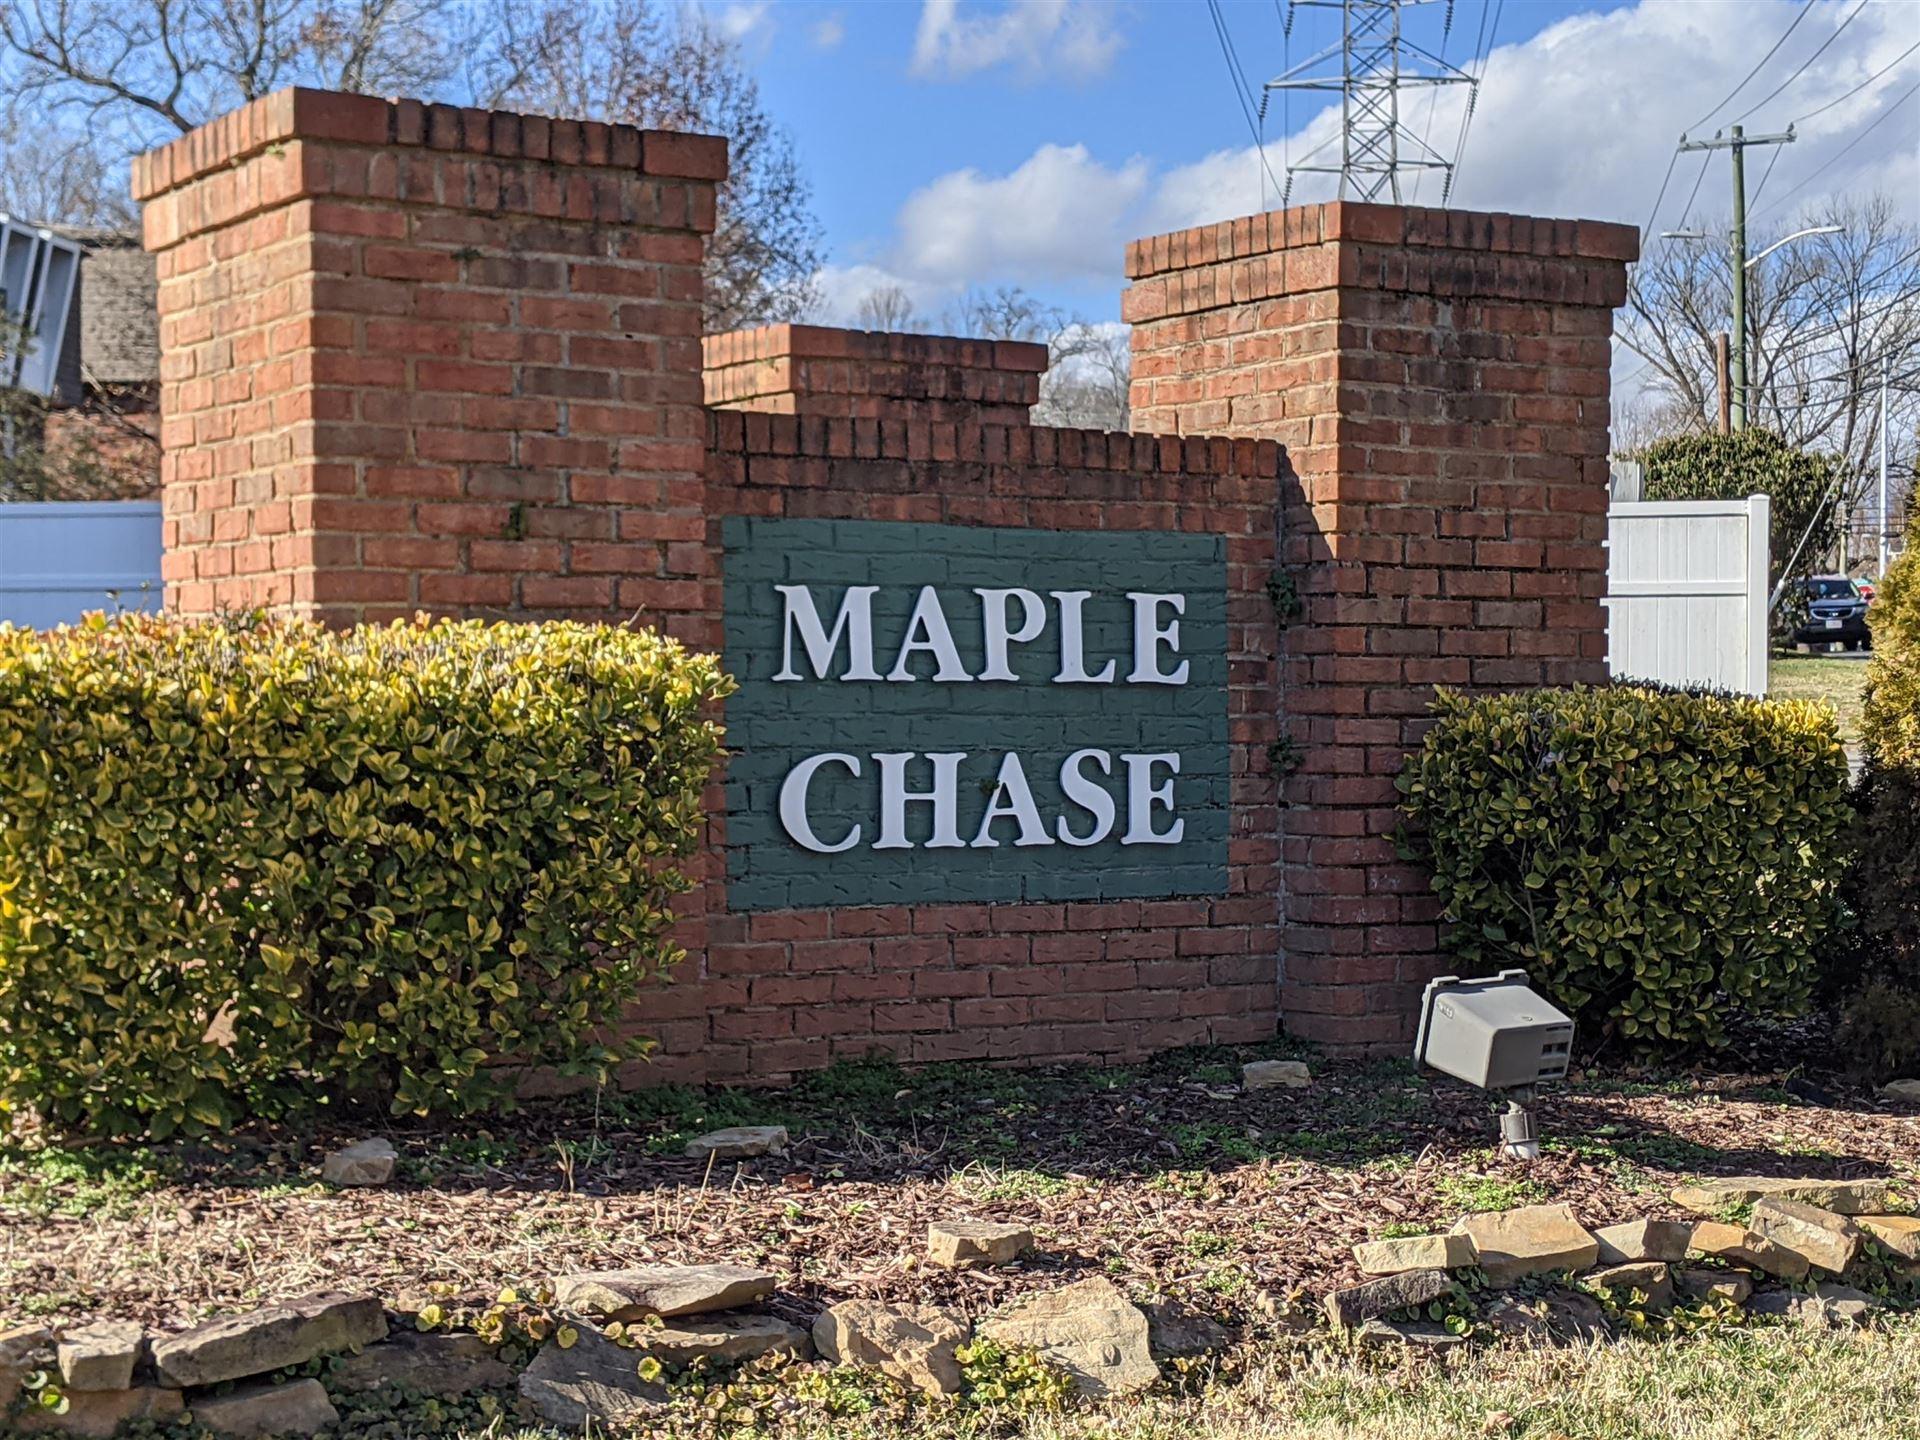 Photo of 4809 Poplar Crest Way, Knoxville, TN 37918 (MLS # 1140092)